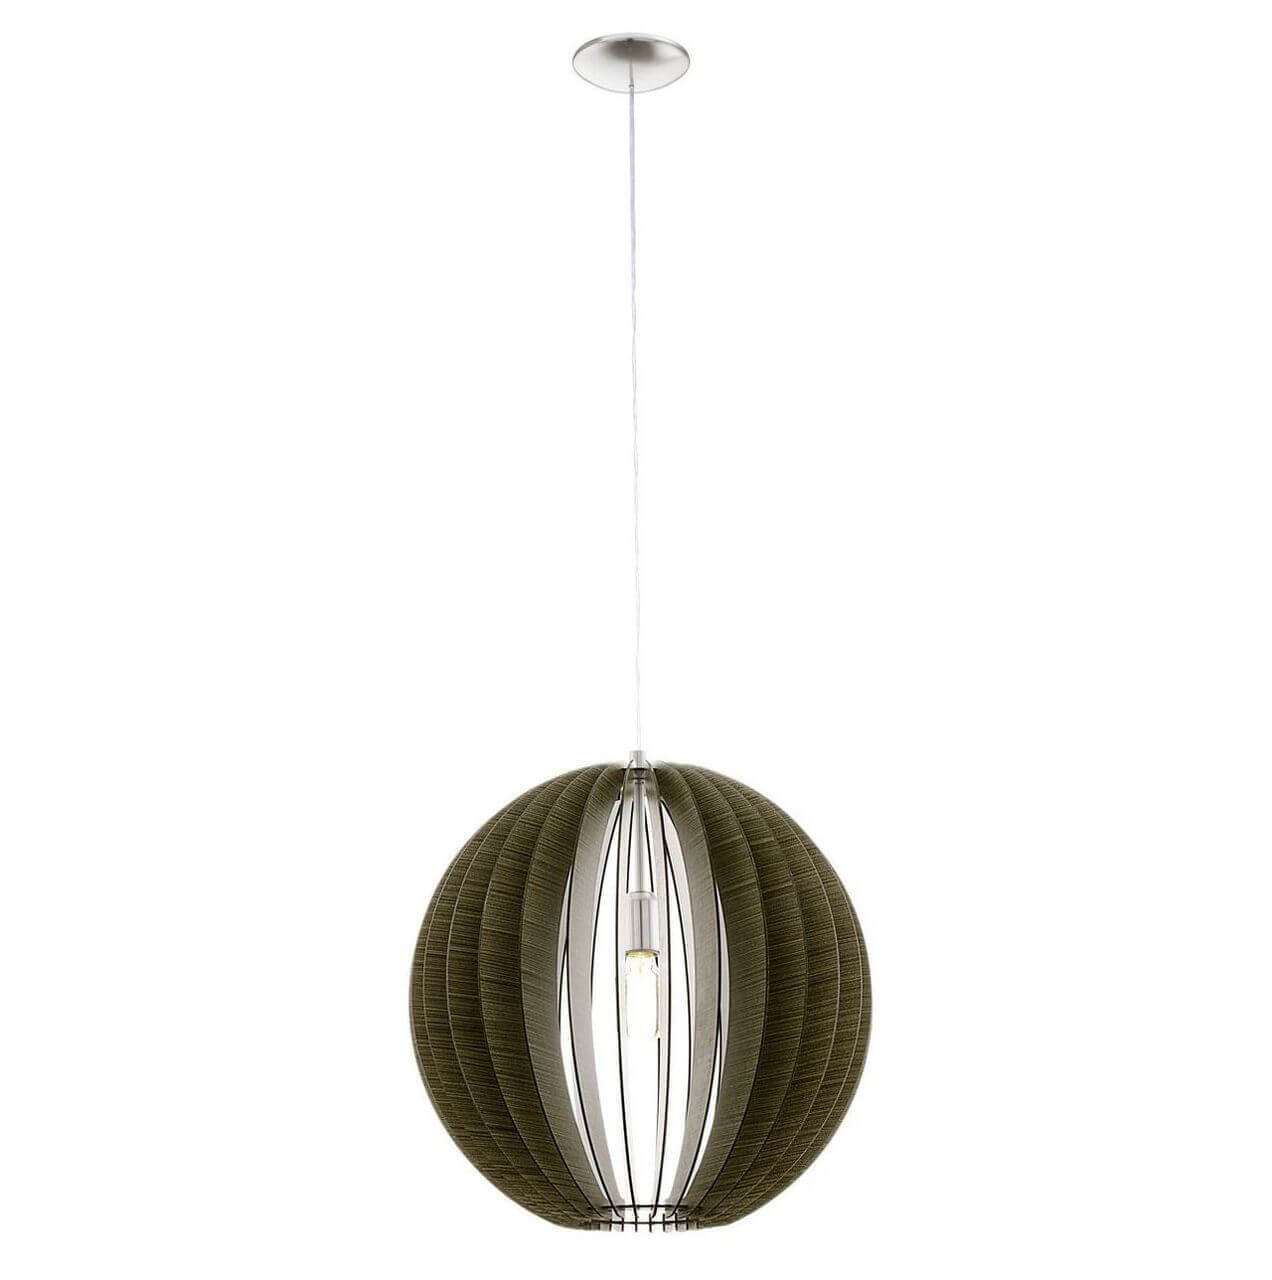 Светильник Eglo 94636 Cossano настольная лампа eglo 94956 cossano